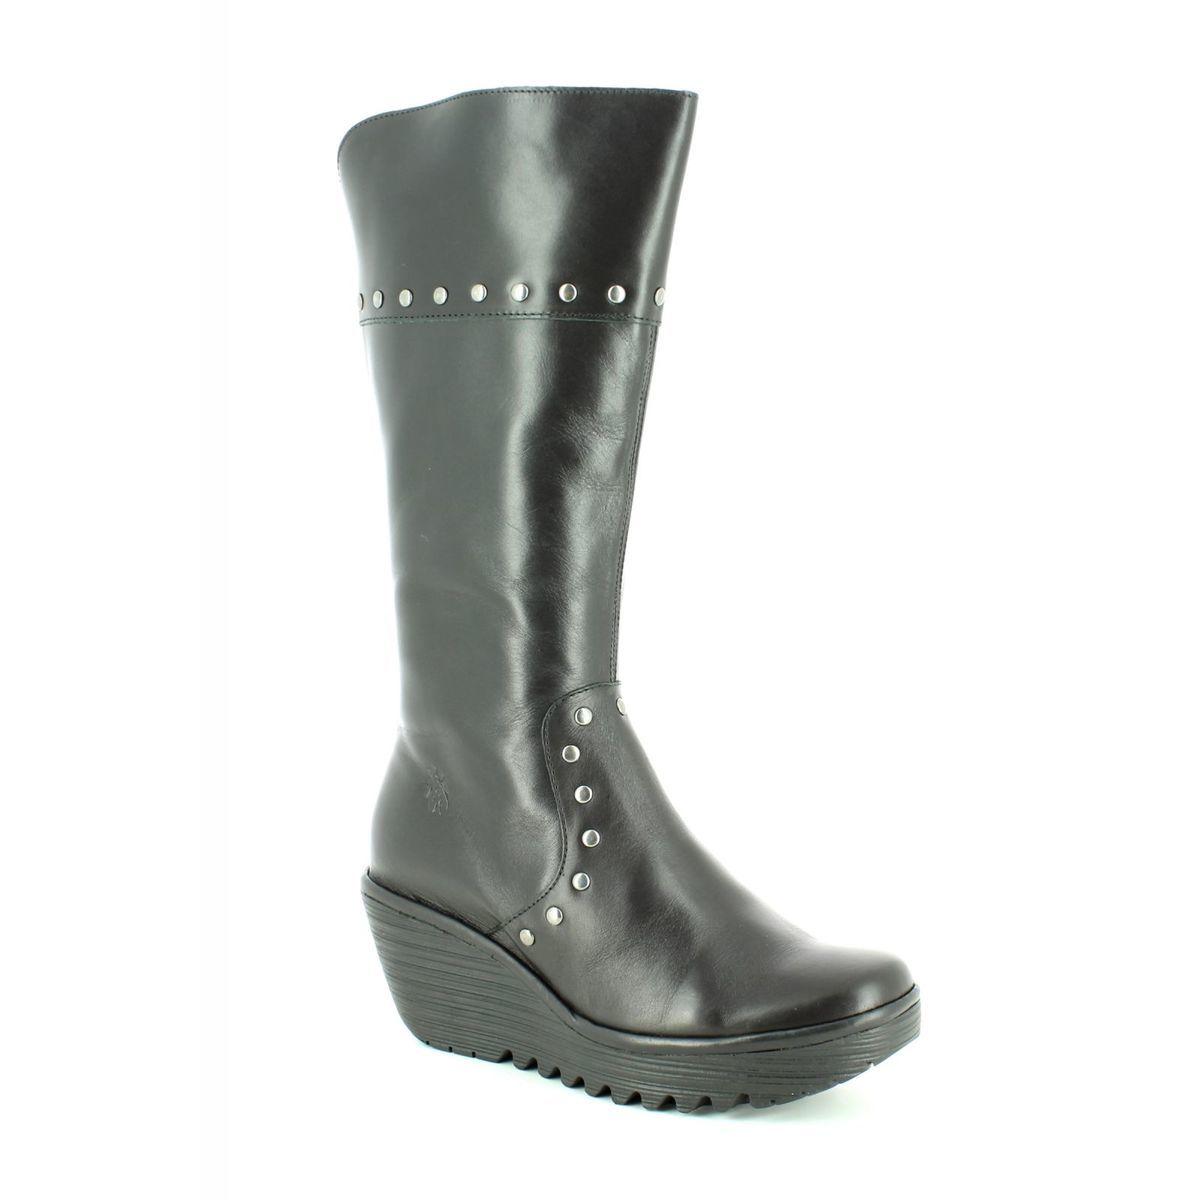 cf460feb Fly London Knee-high Boots - Black leather - P500903 YOTA